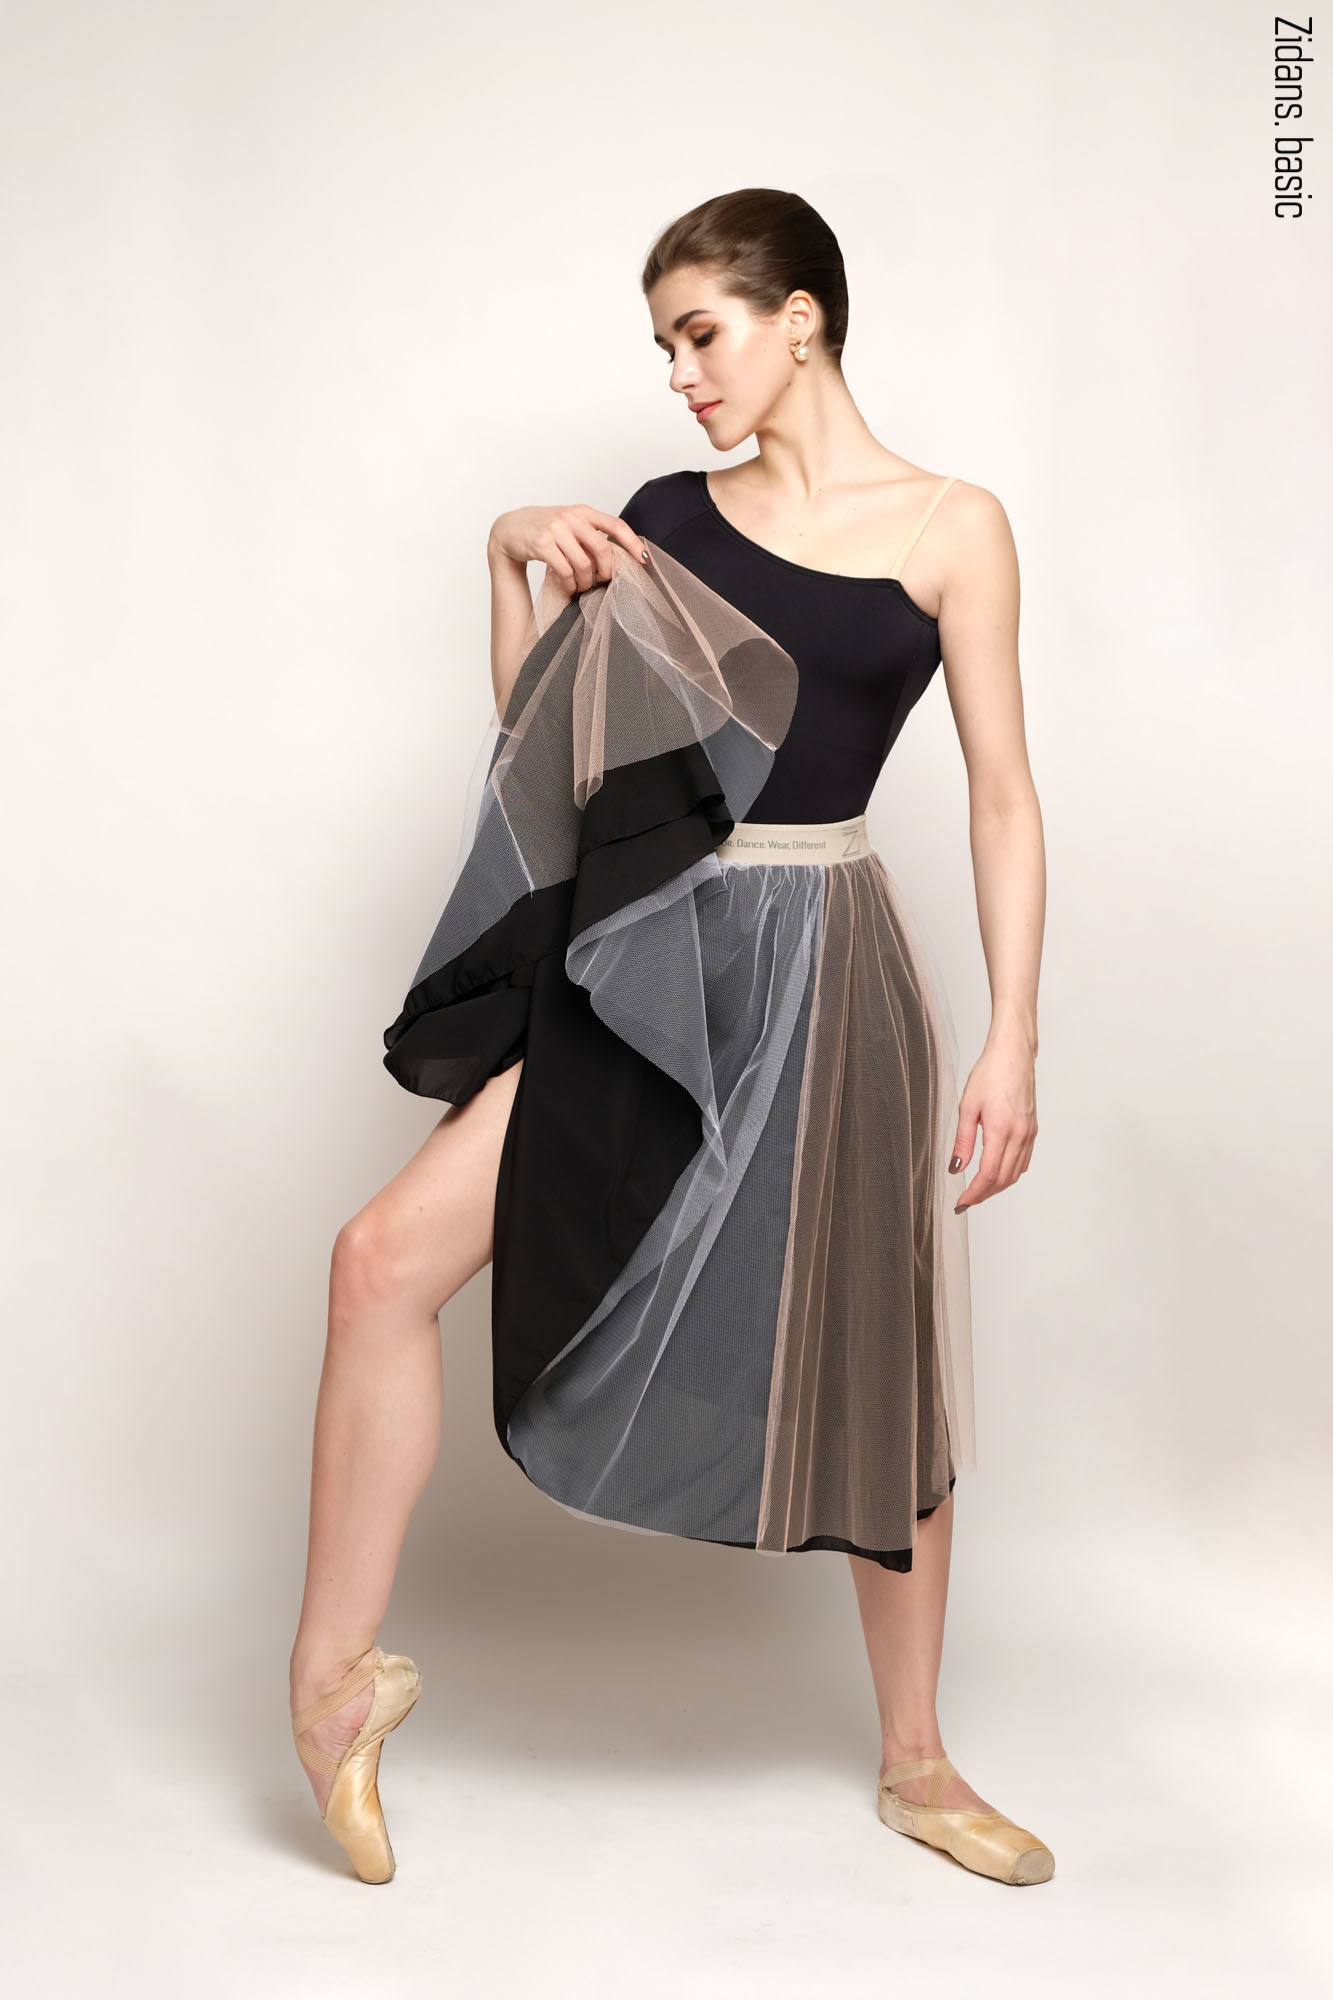 Комплект: 1 Рукав 1 Лямка + юбка-шопенка basic